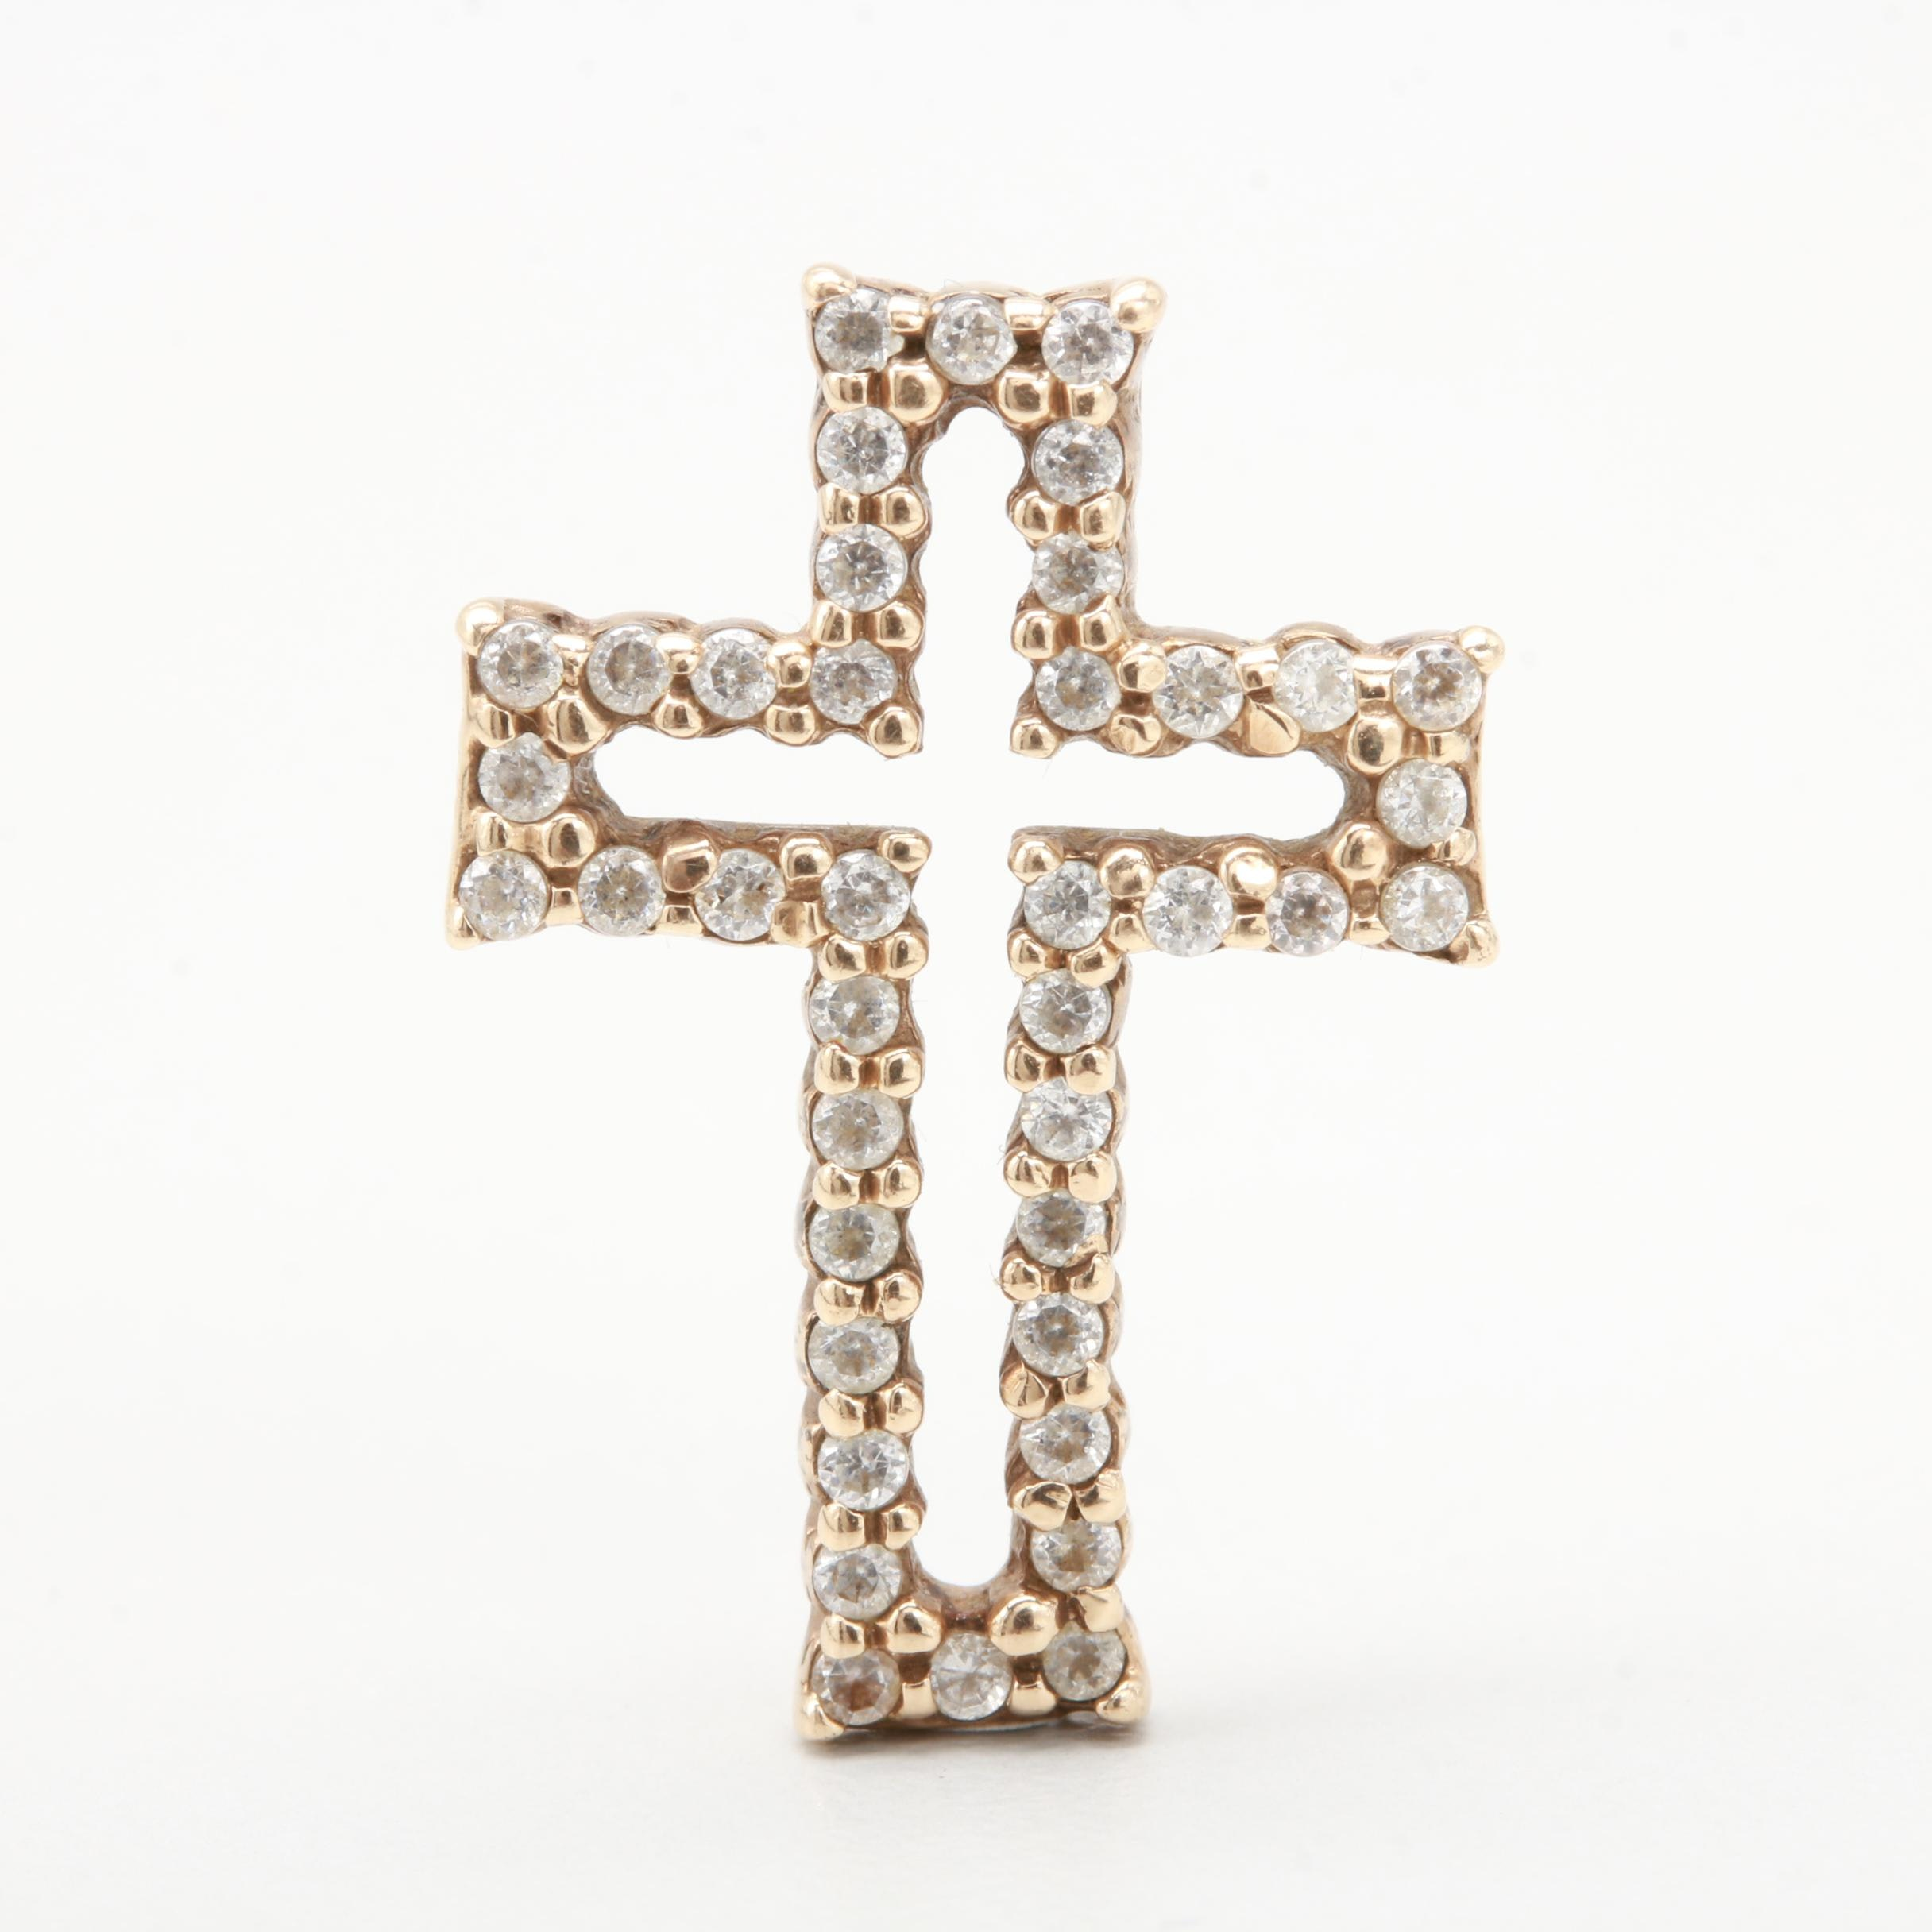 10K Yellow Gold Cubic Zirconia Cross Pendant